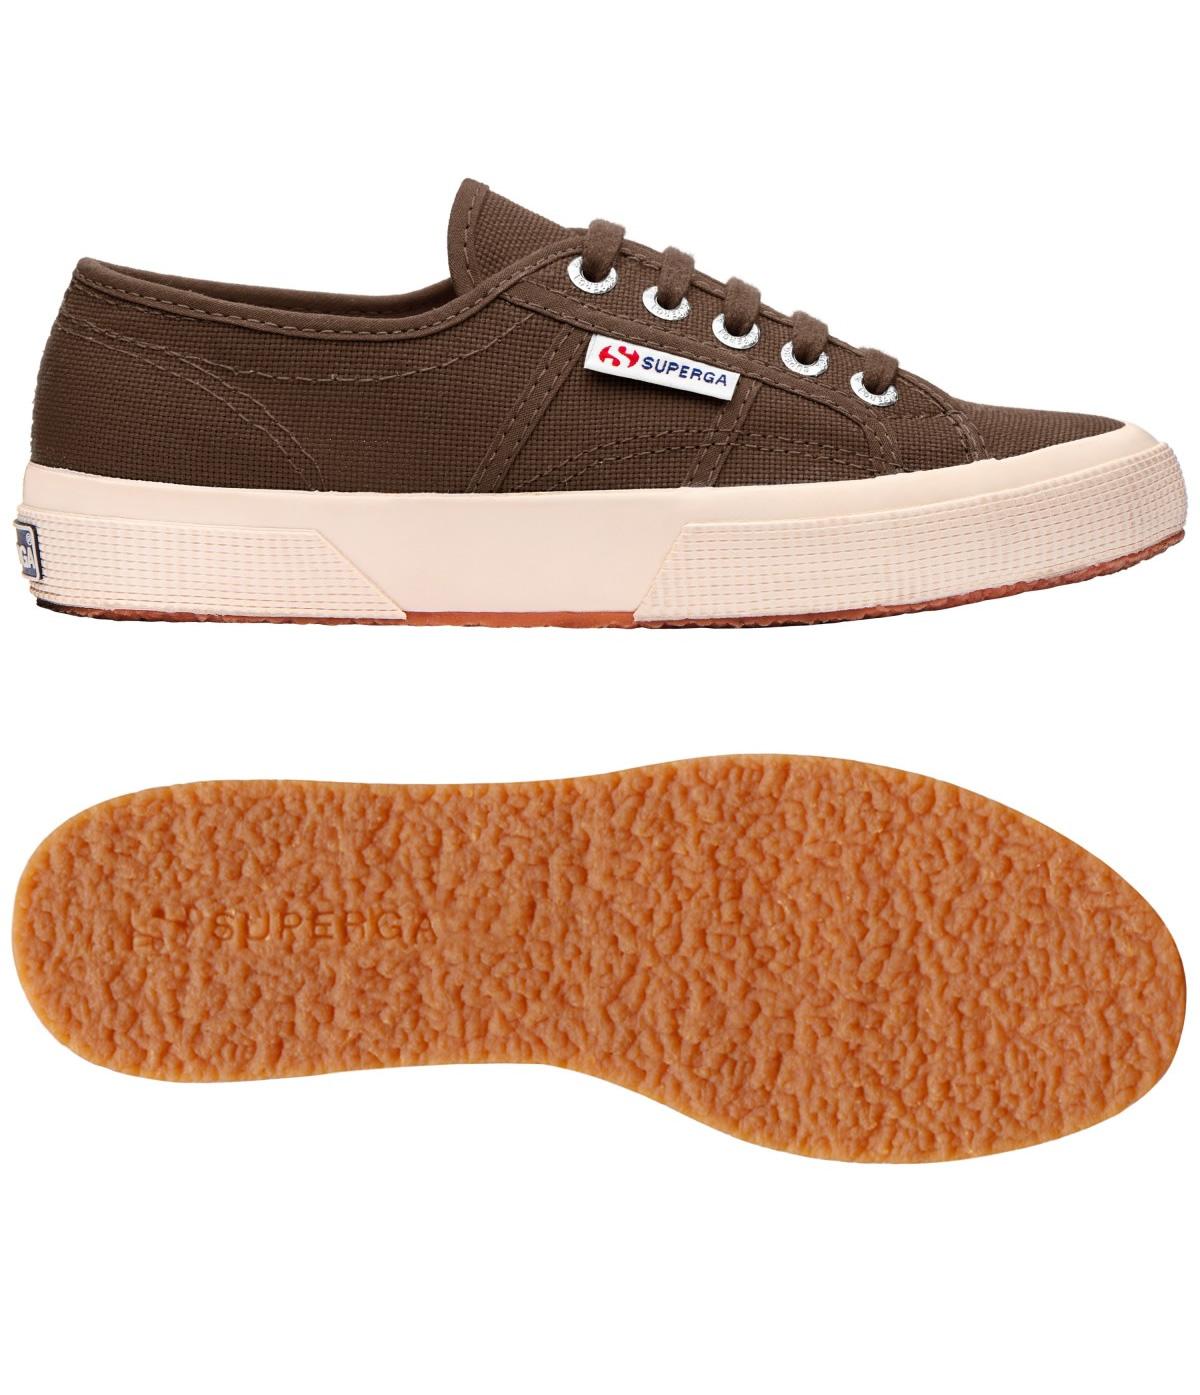 Zapatillas Superga marrón 2750